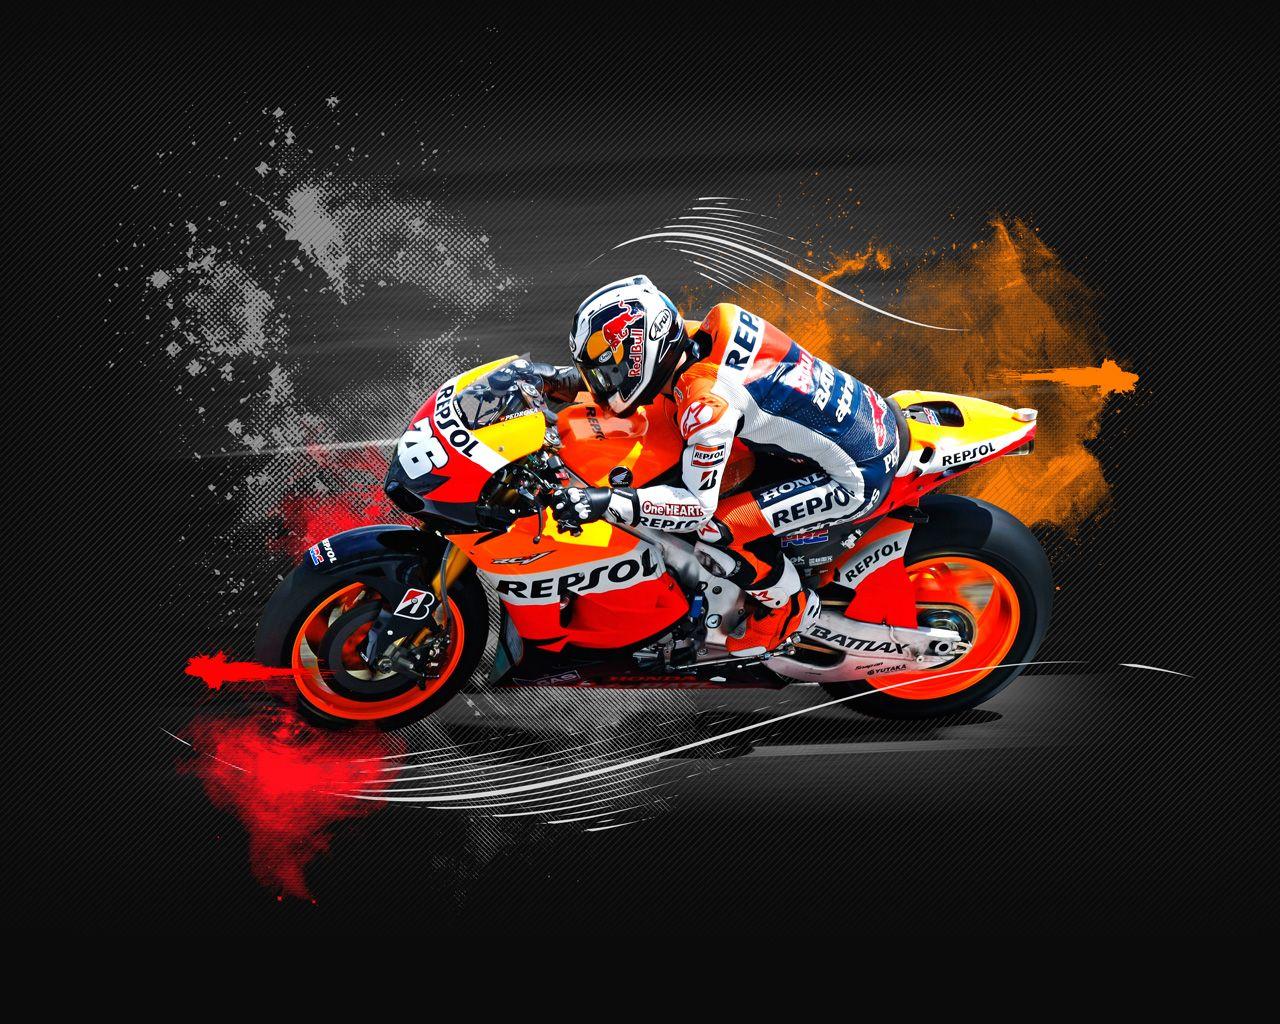 Motogp Wallpaper Hd Motogp Ducati Hypermotard Ducati Get wallpaper motogp hd for android